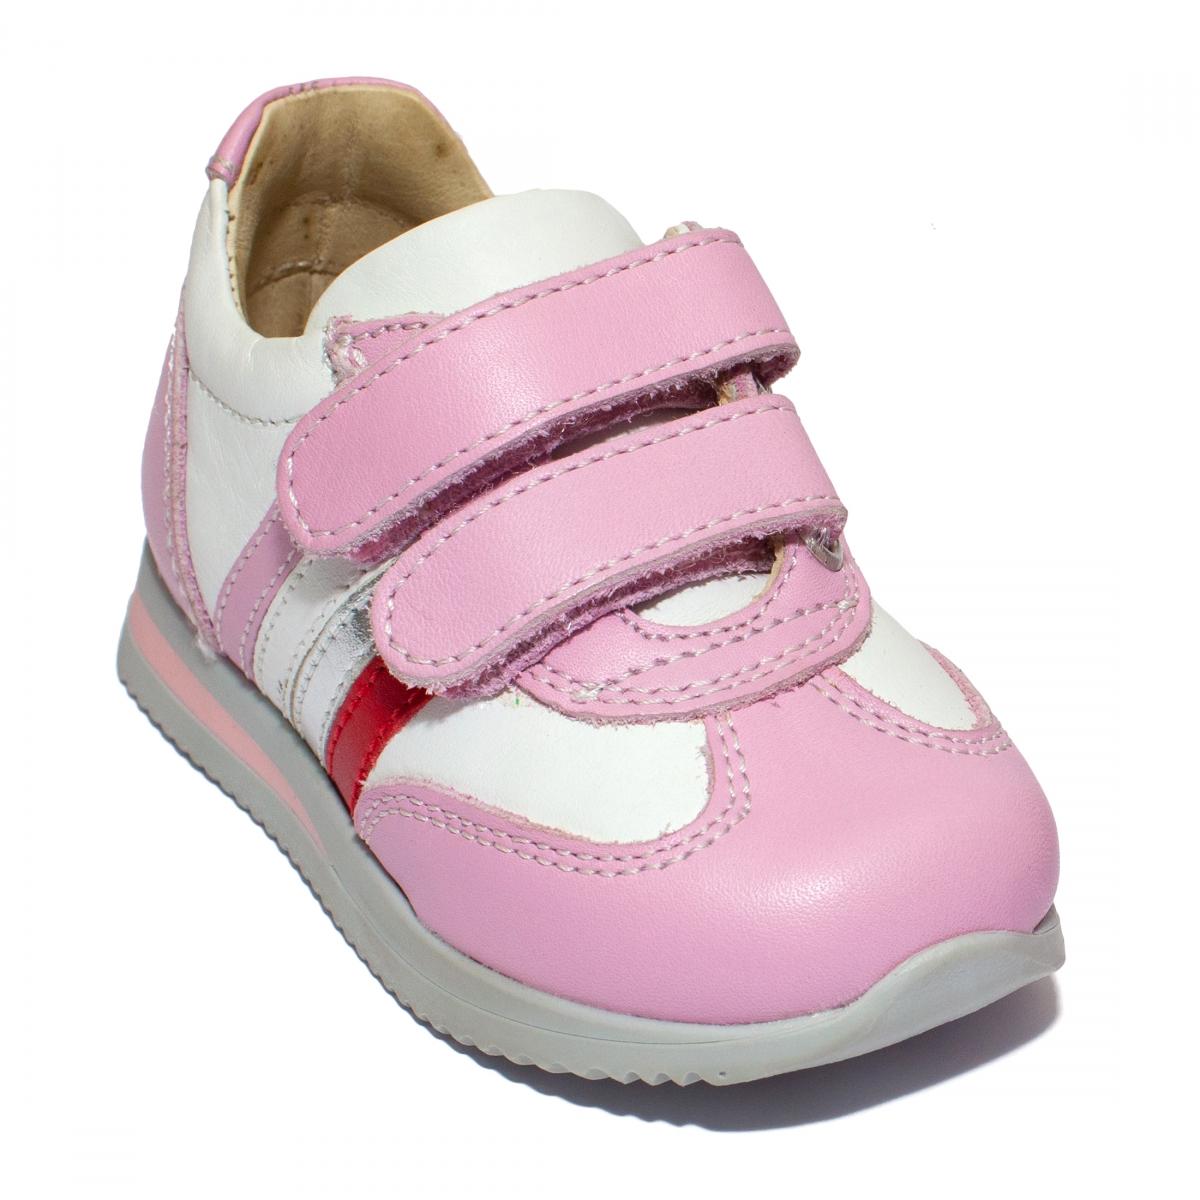 Pantofi sport fete 730 alb roz 19-28